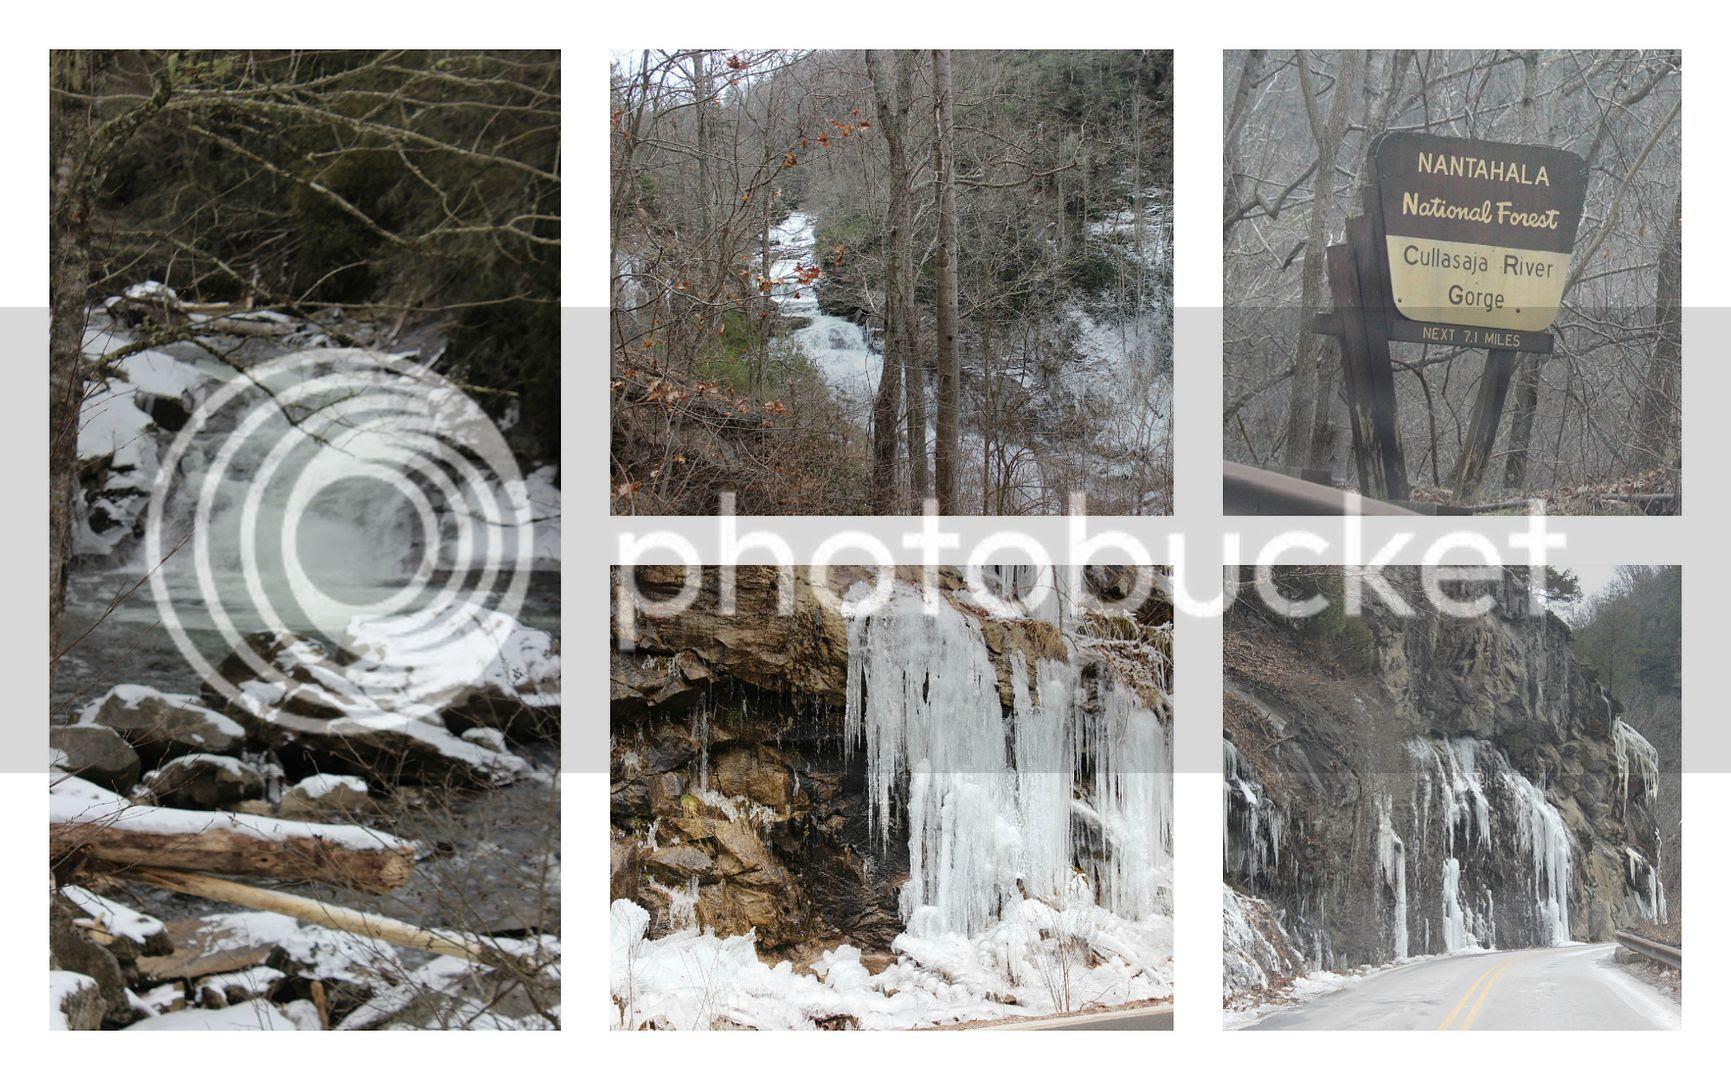 photo mountains.collage4_zps6lj0xsbp.jpg